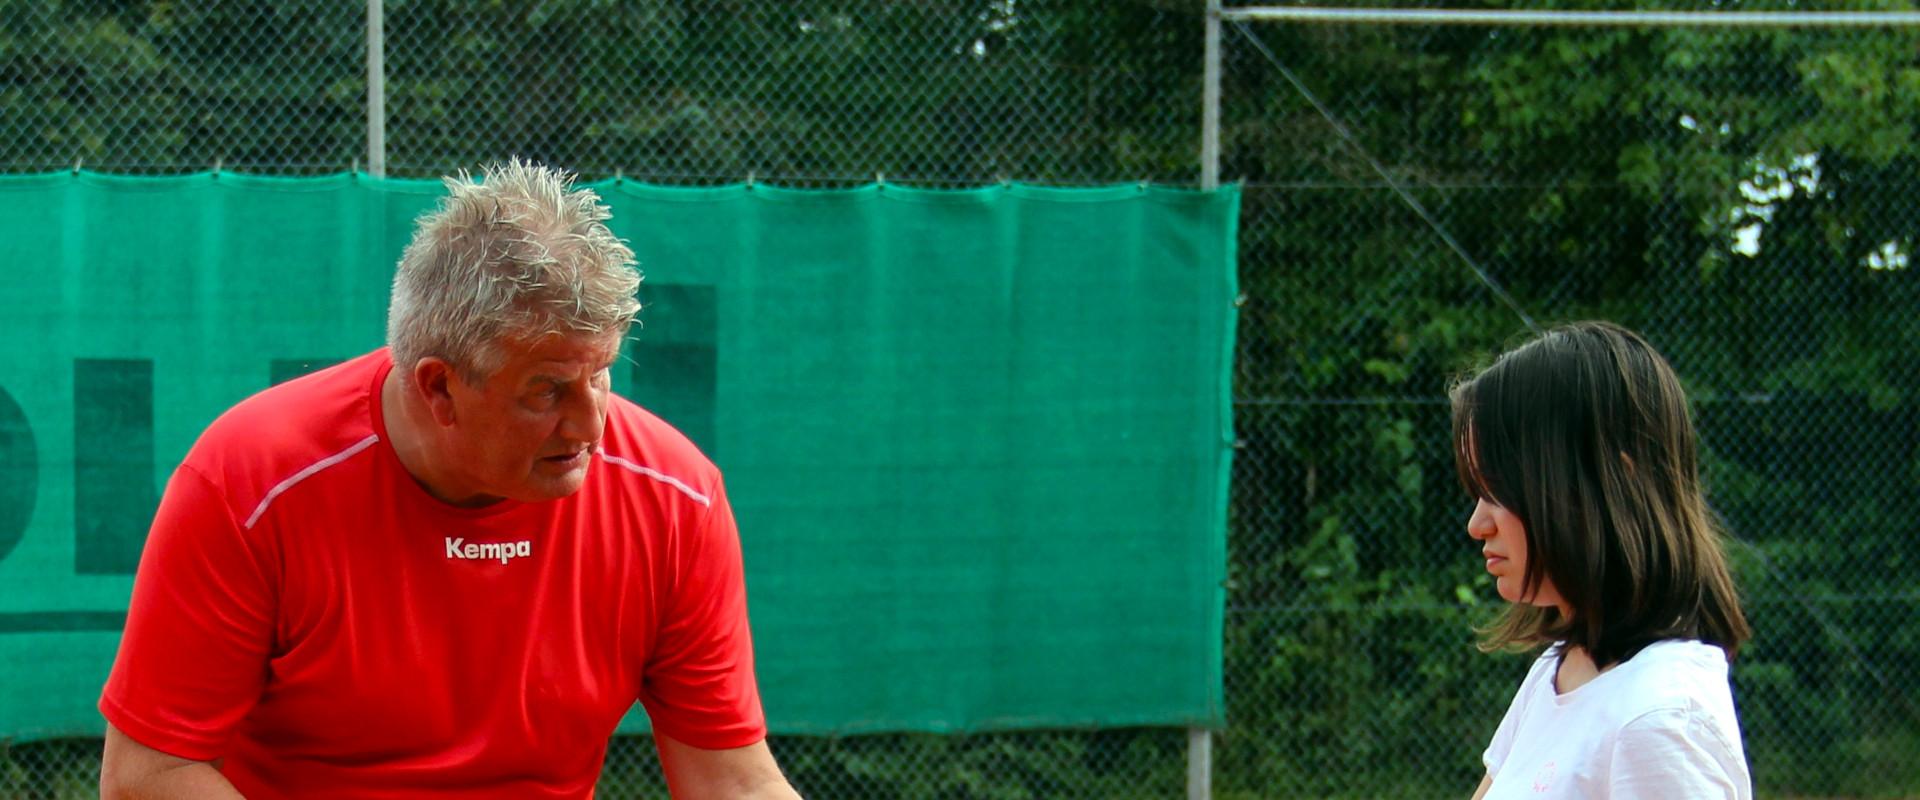 2021 - Header - Tennis - Schnupperkurs